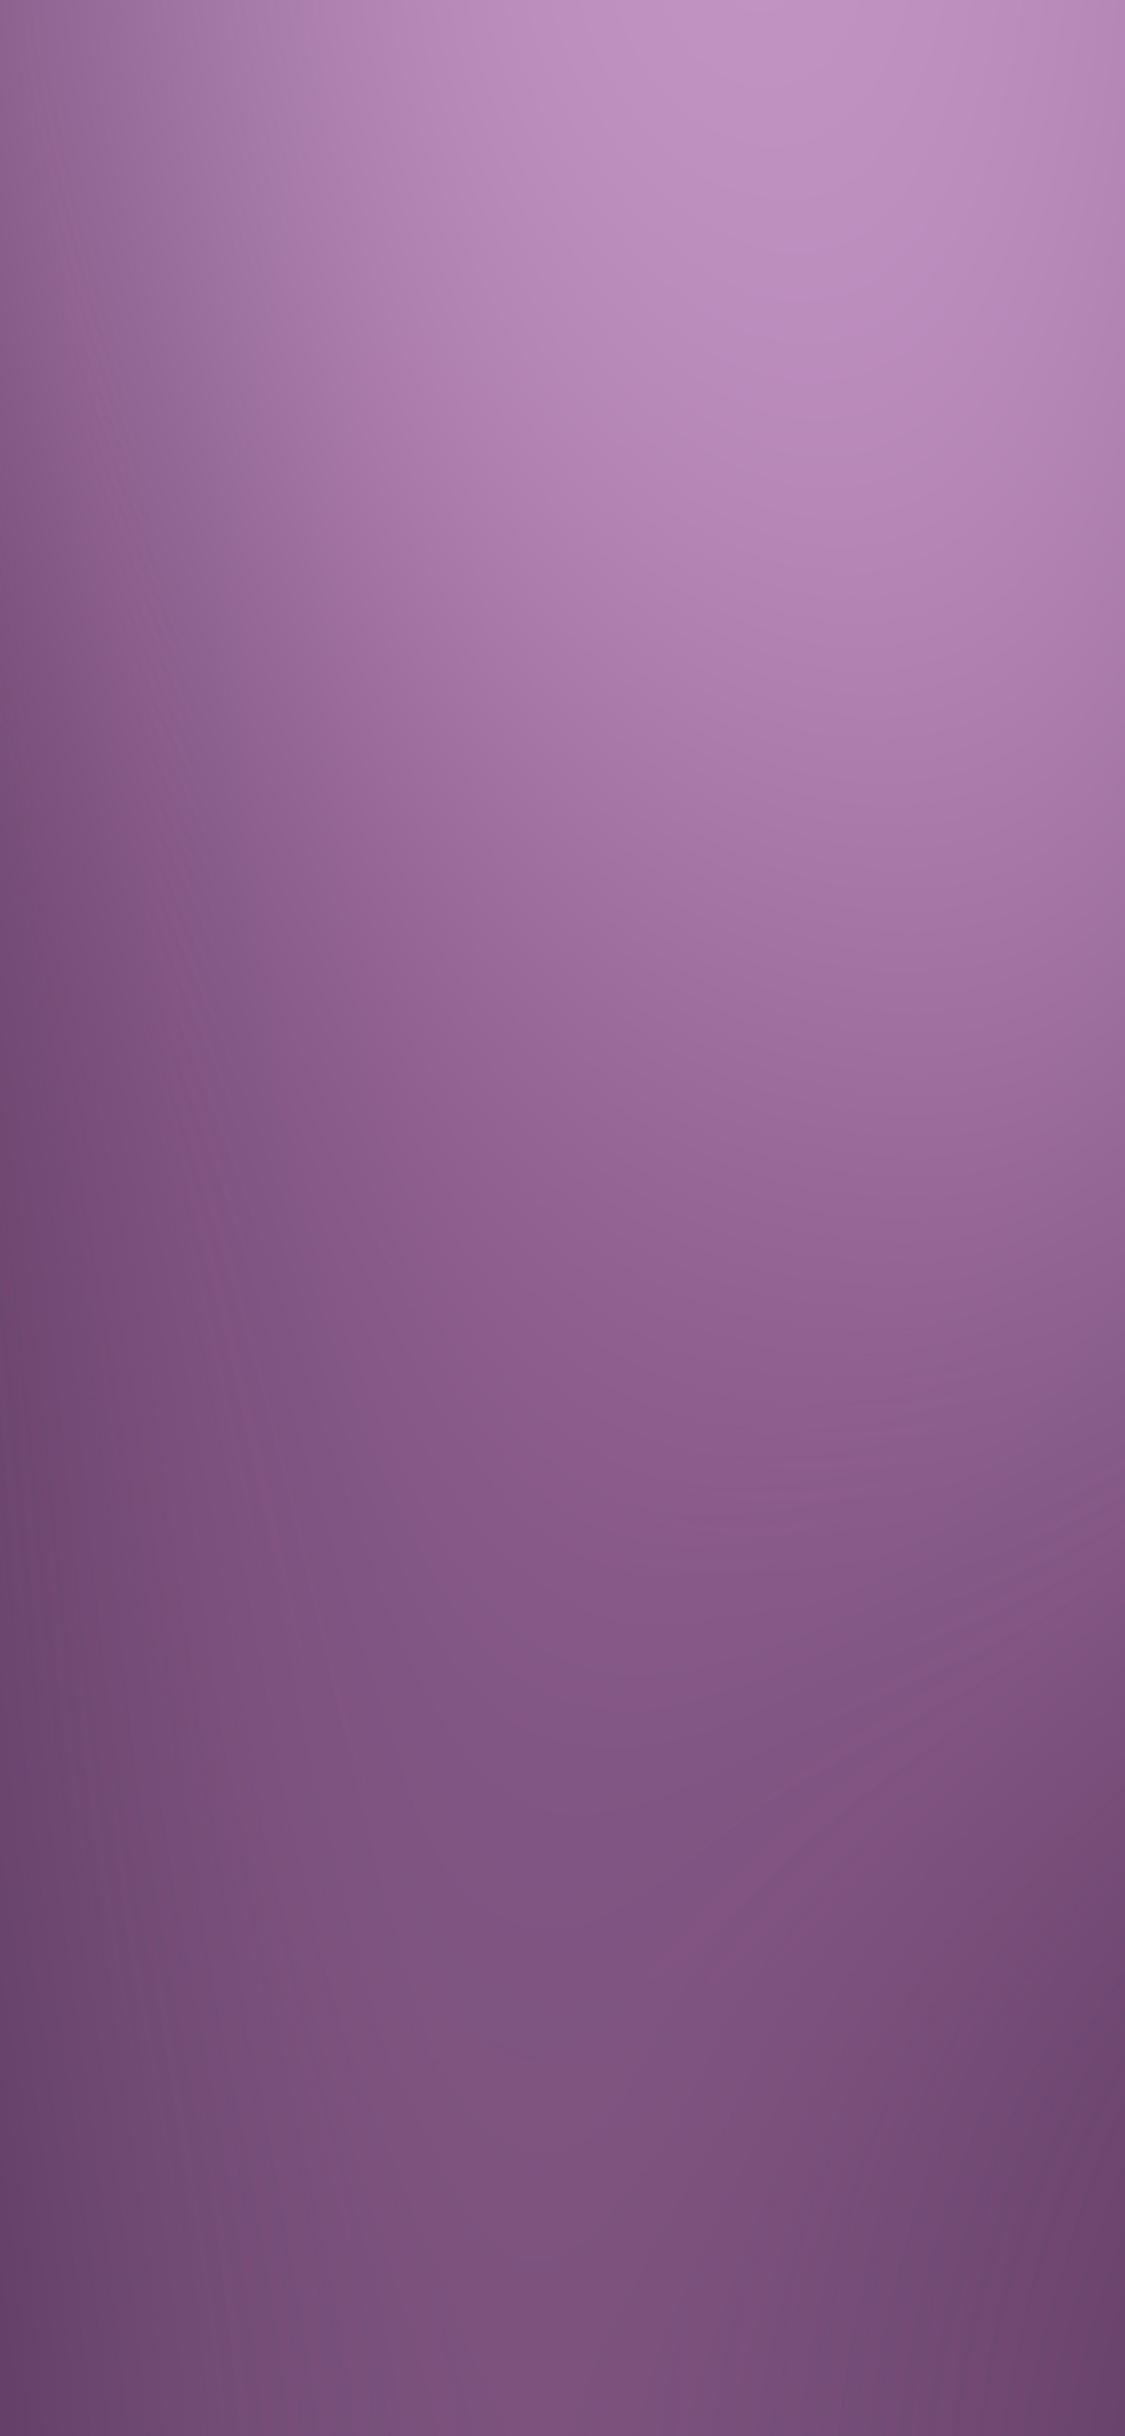 iPhoneXpapers.com-Apple-iPhone-wallpaper-sf88-purple-solid-gradation-blur